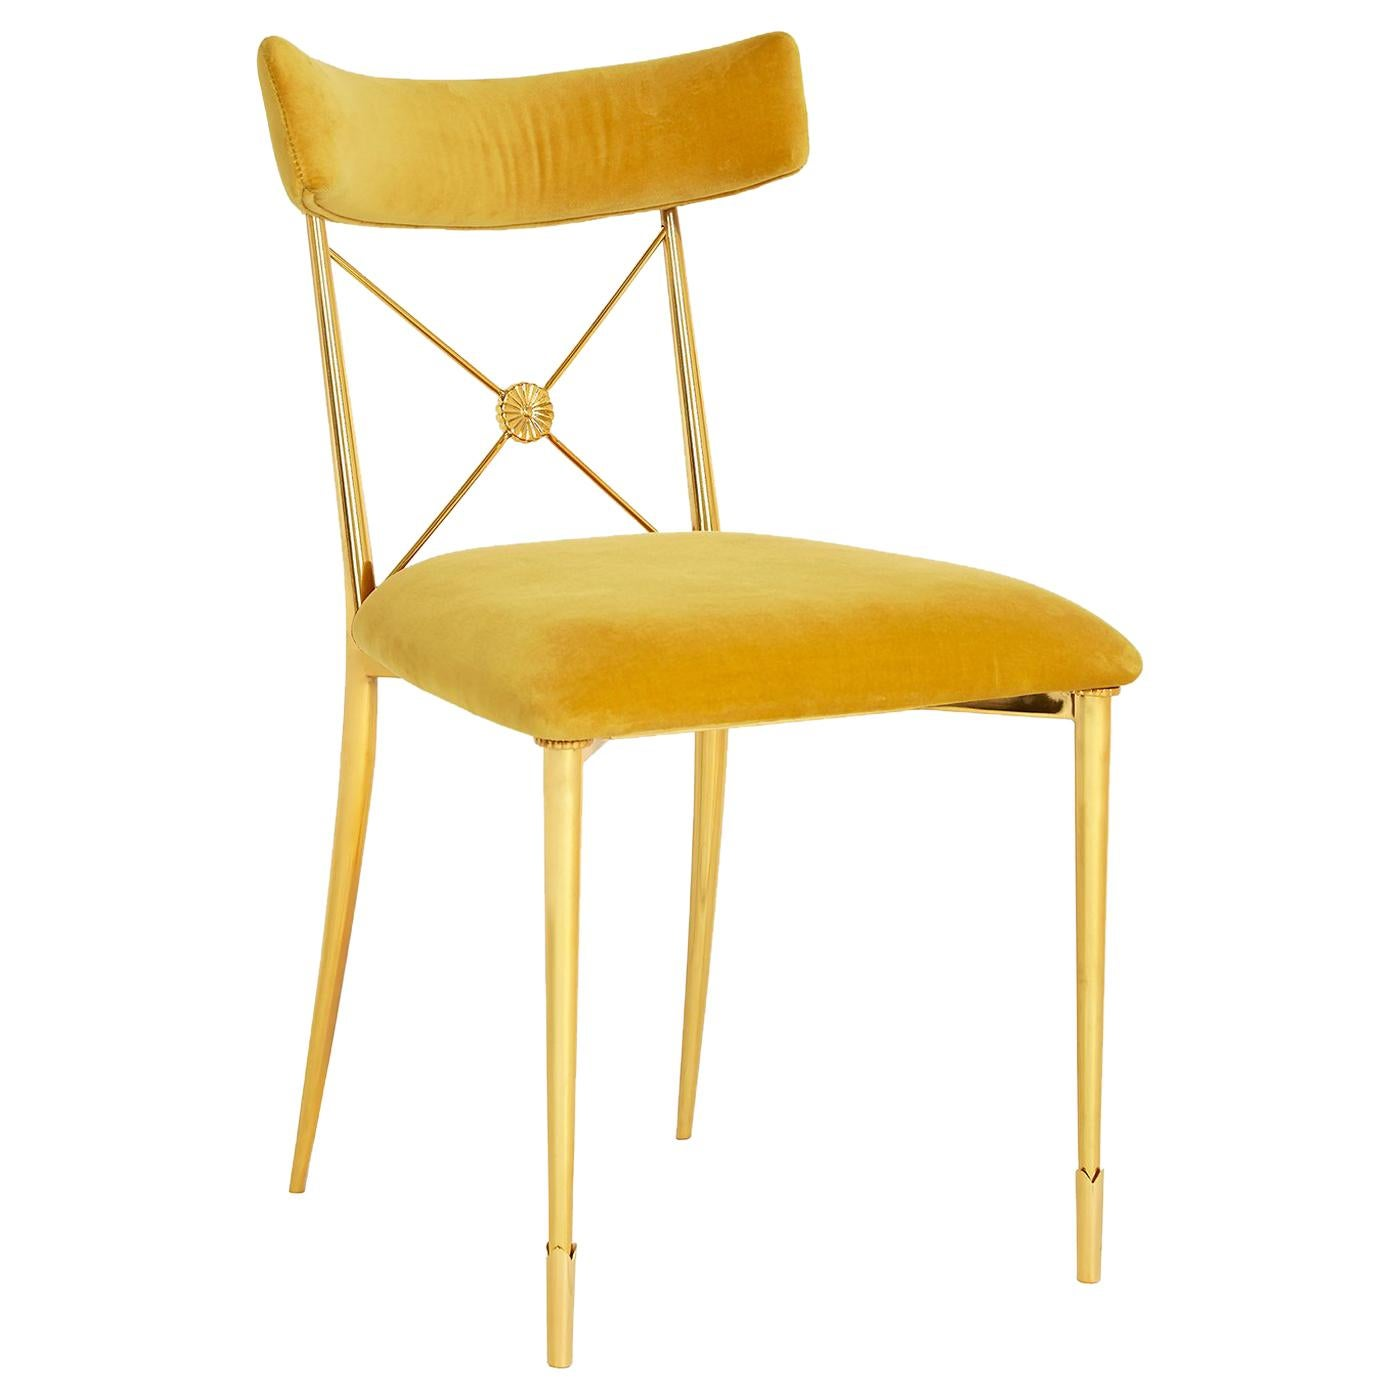 Rider Gold Velvet and Brass Dining Chair